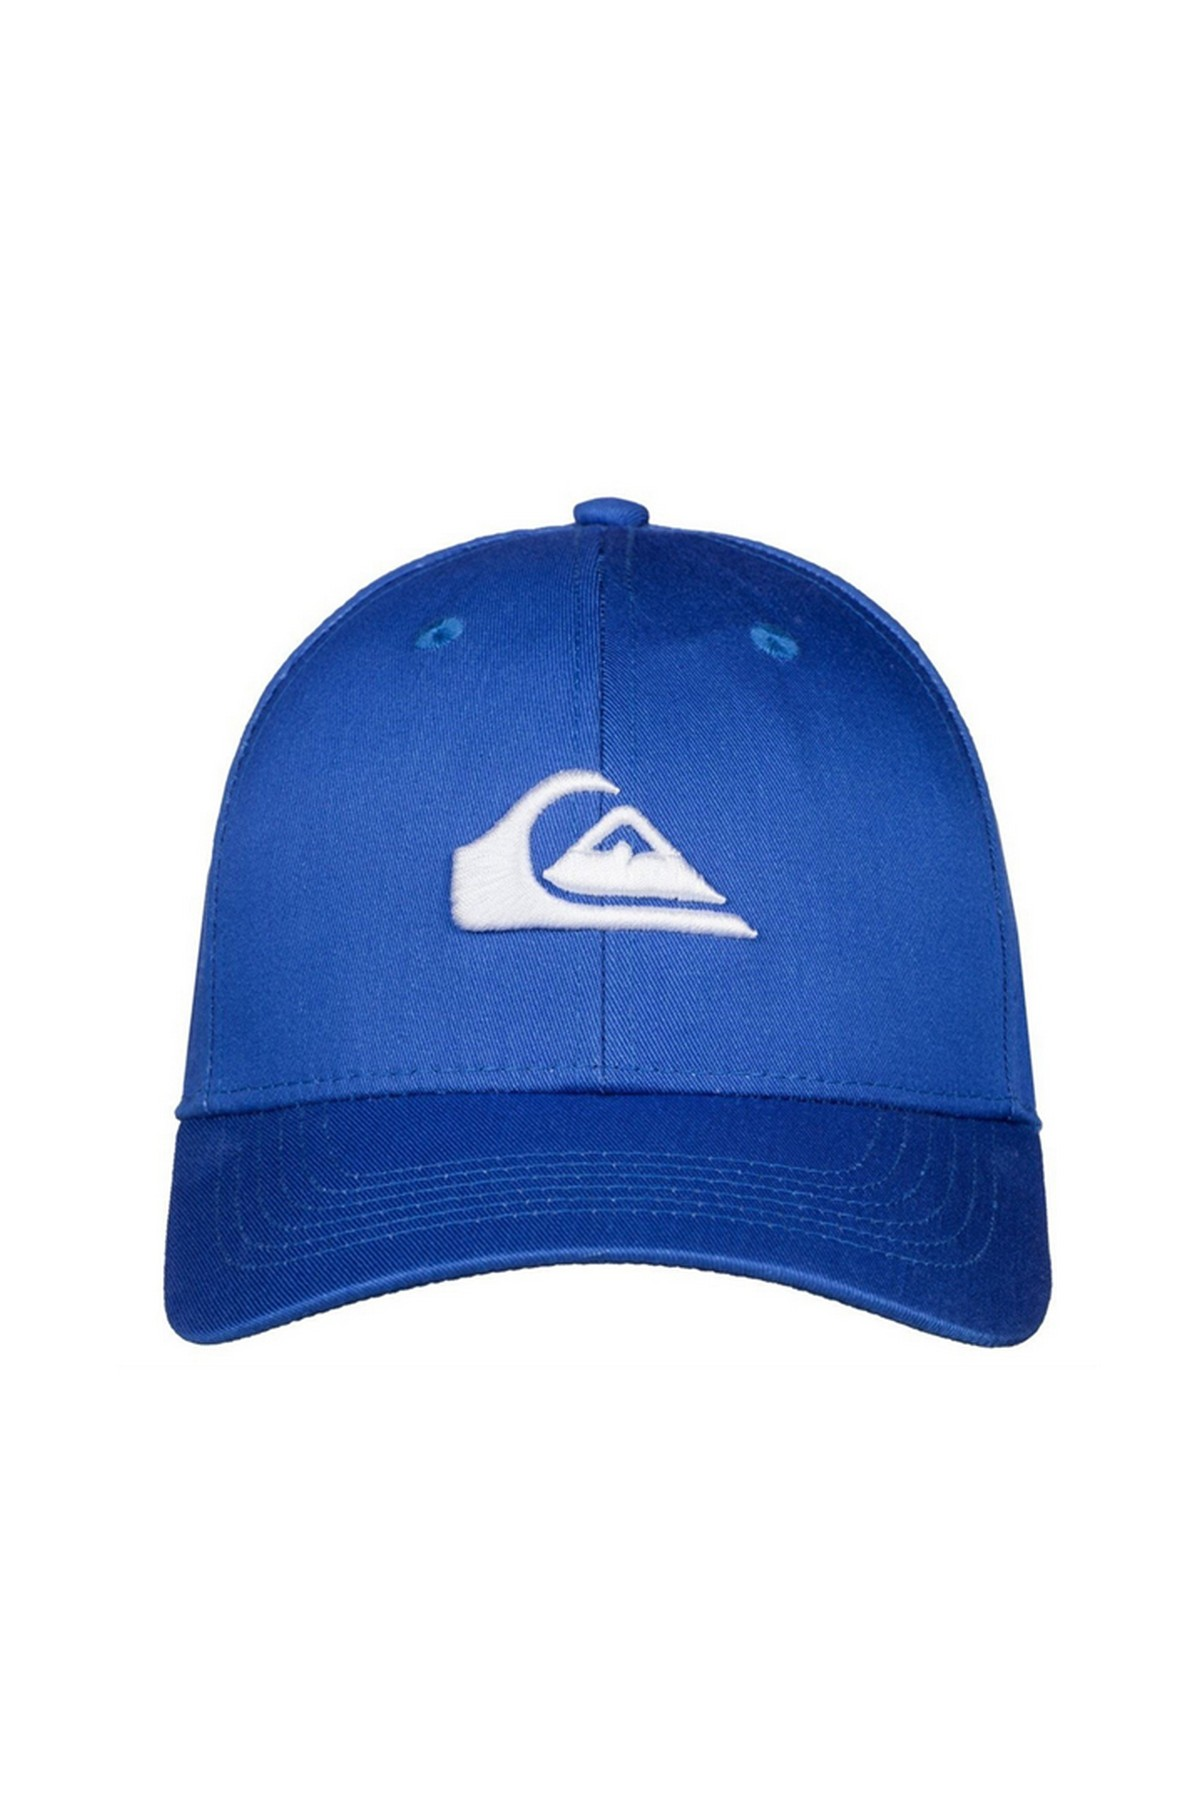 Quiksilver Decades M Şapka  (AQYHA03387-BRCO)